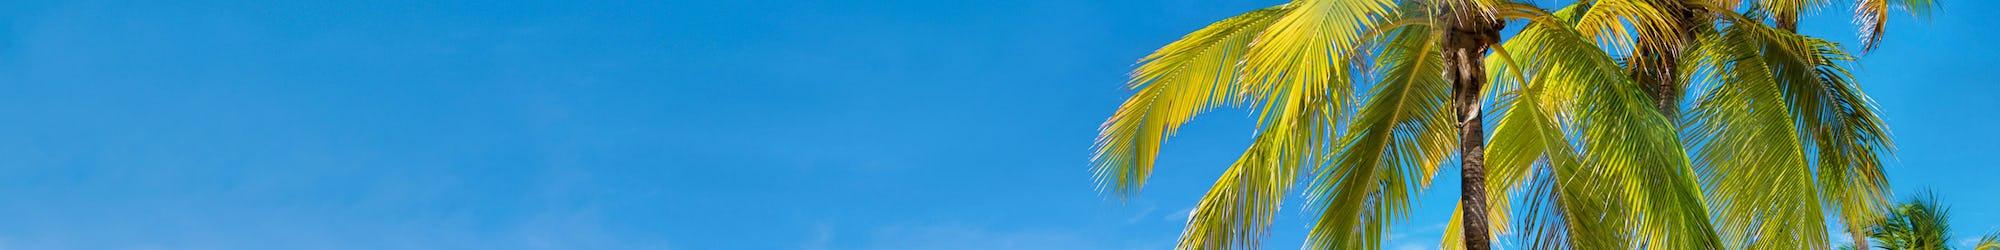 Karibia